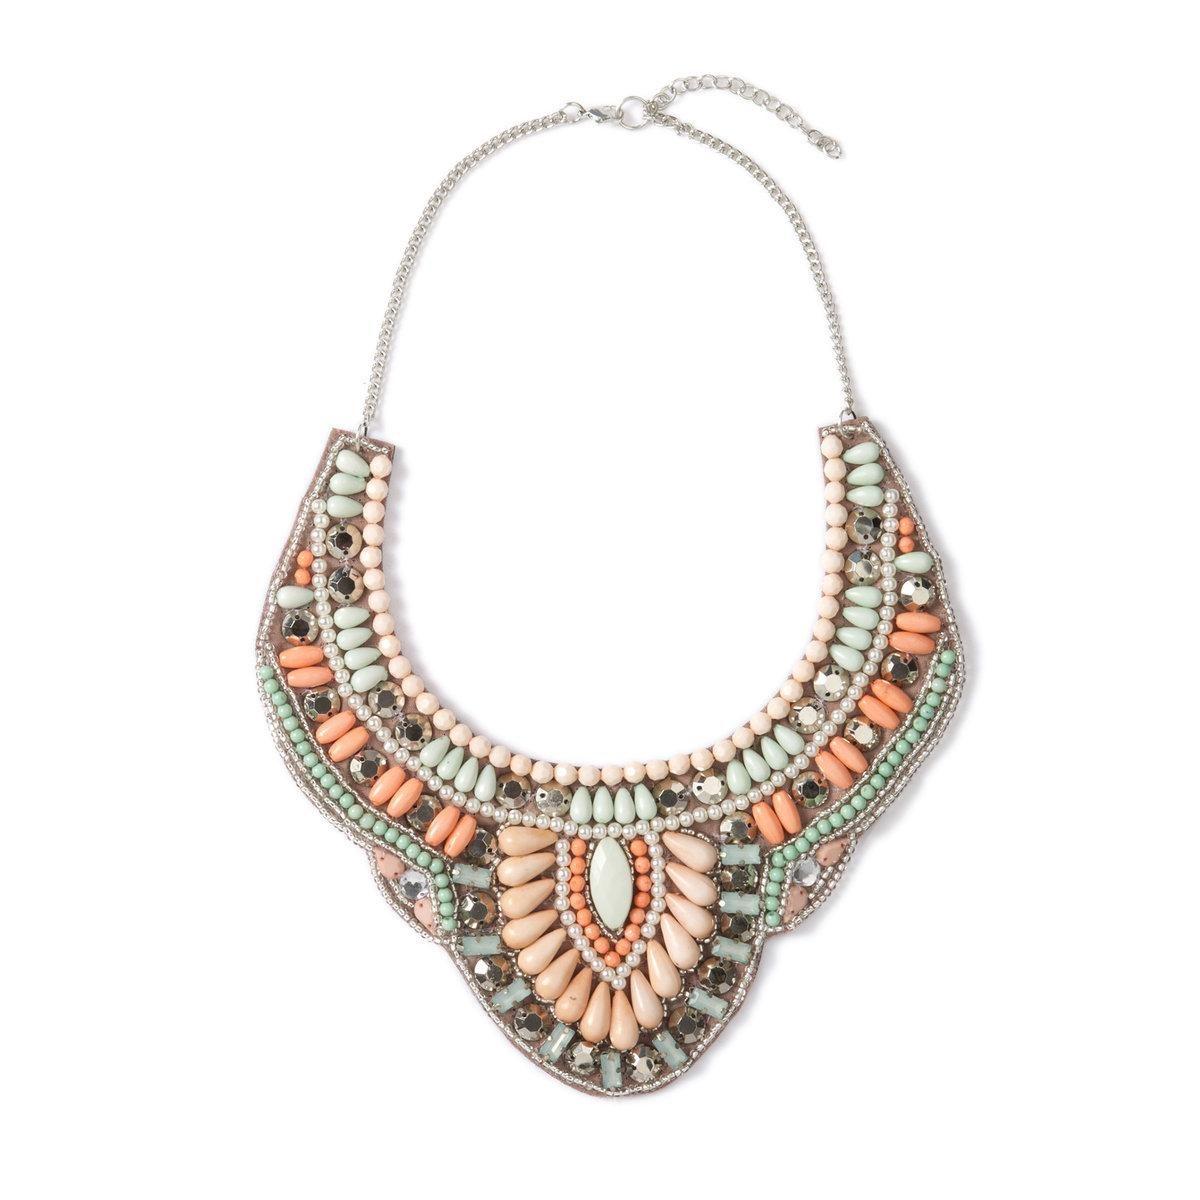 Collier plastron perles et strass Mademoiselle R